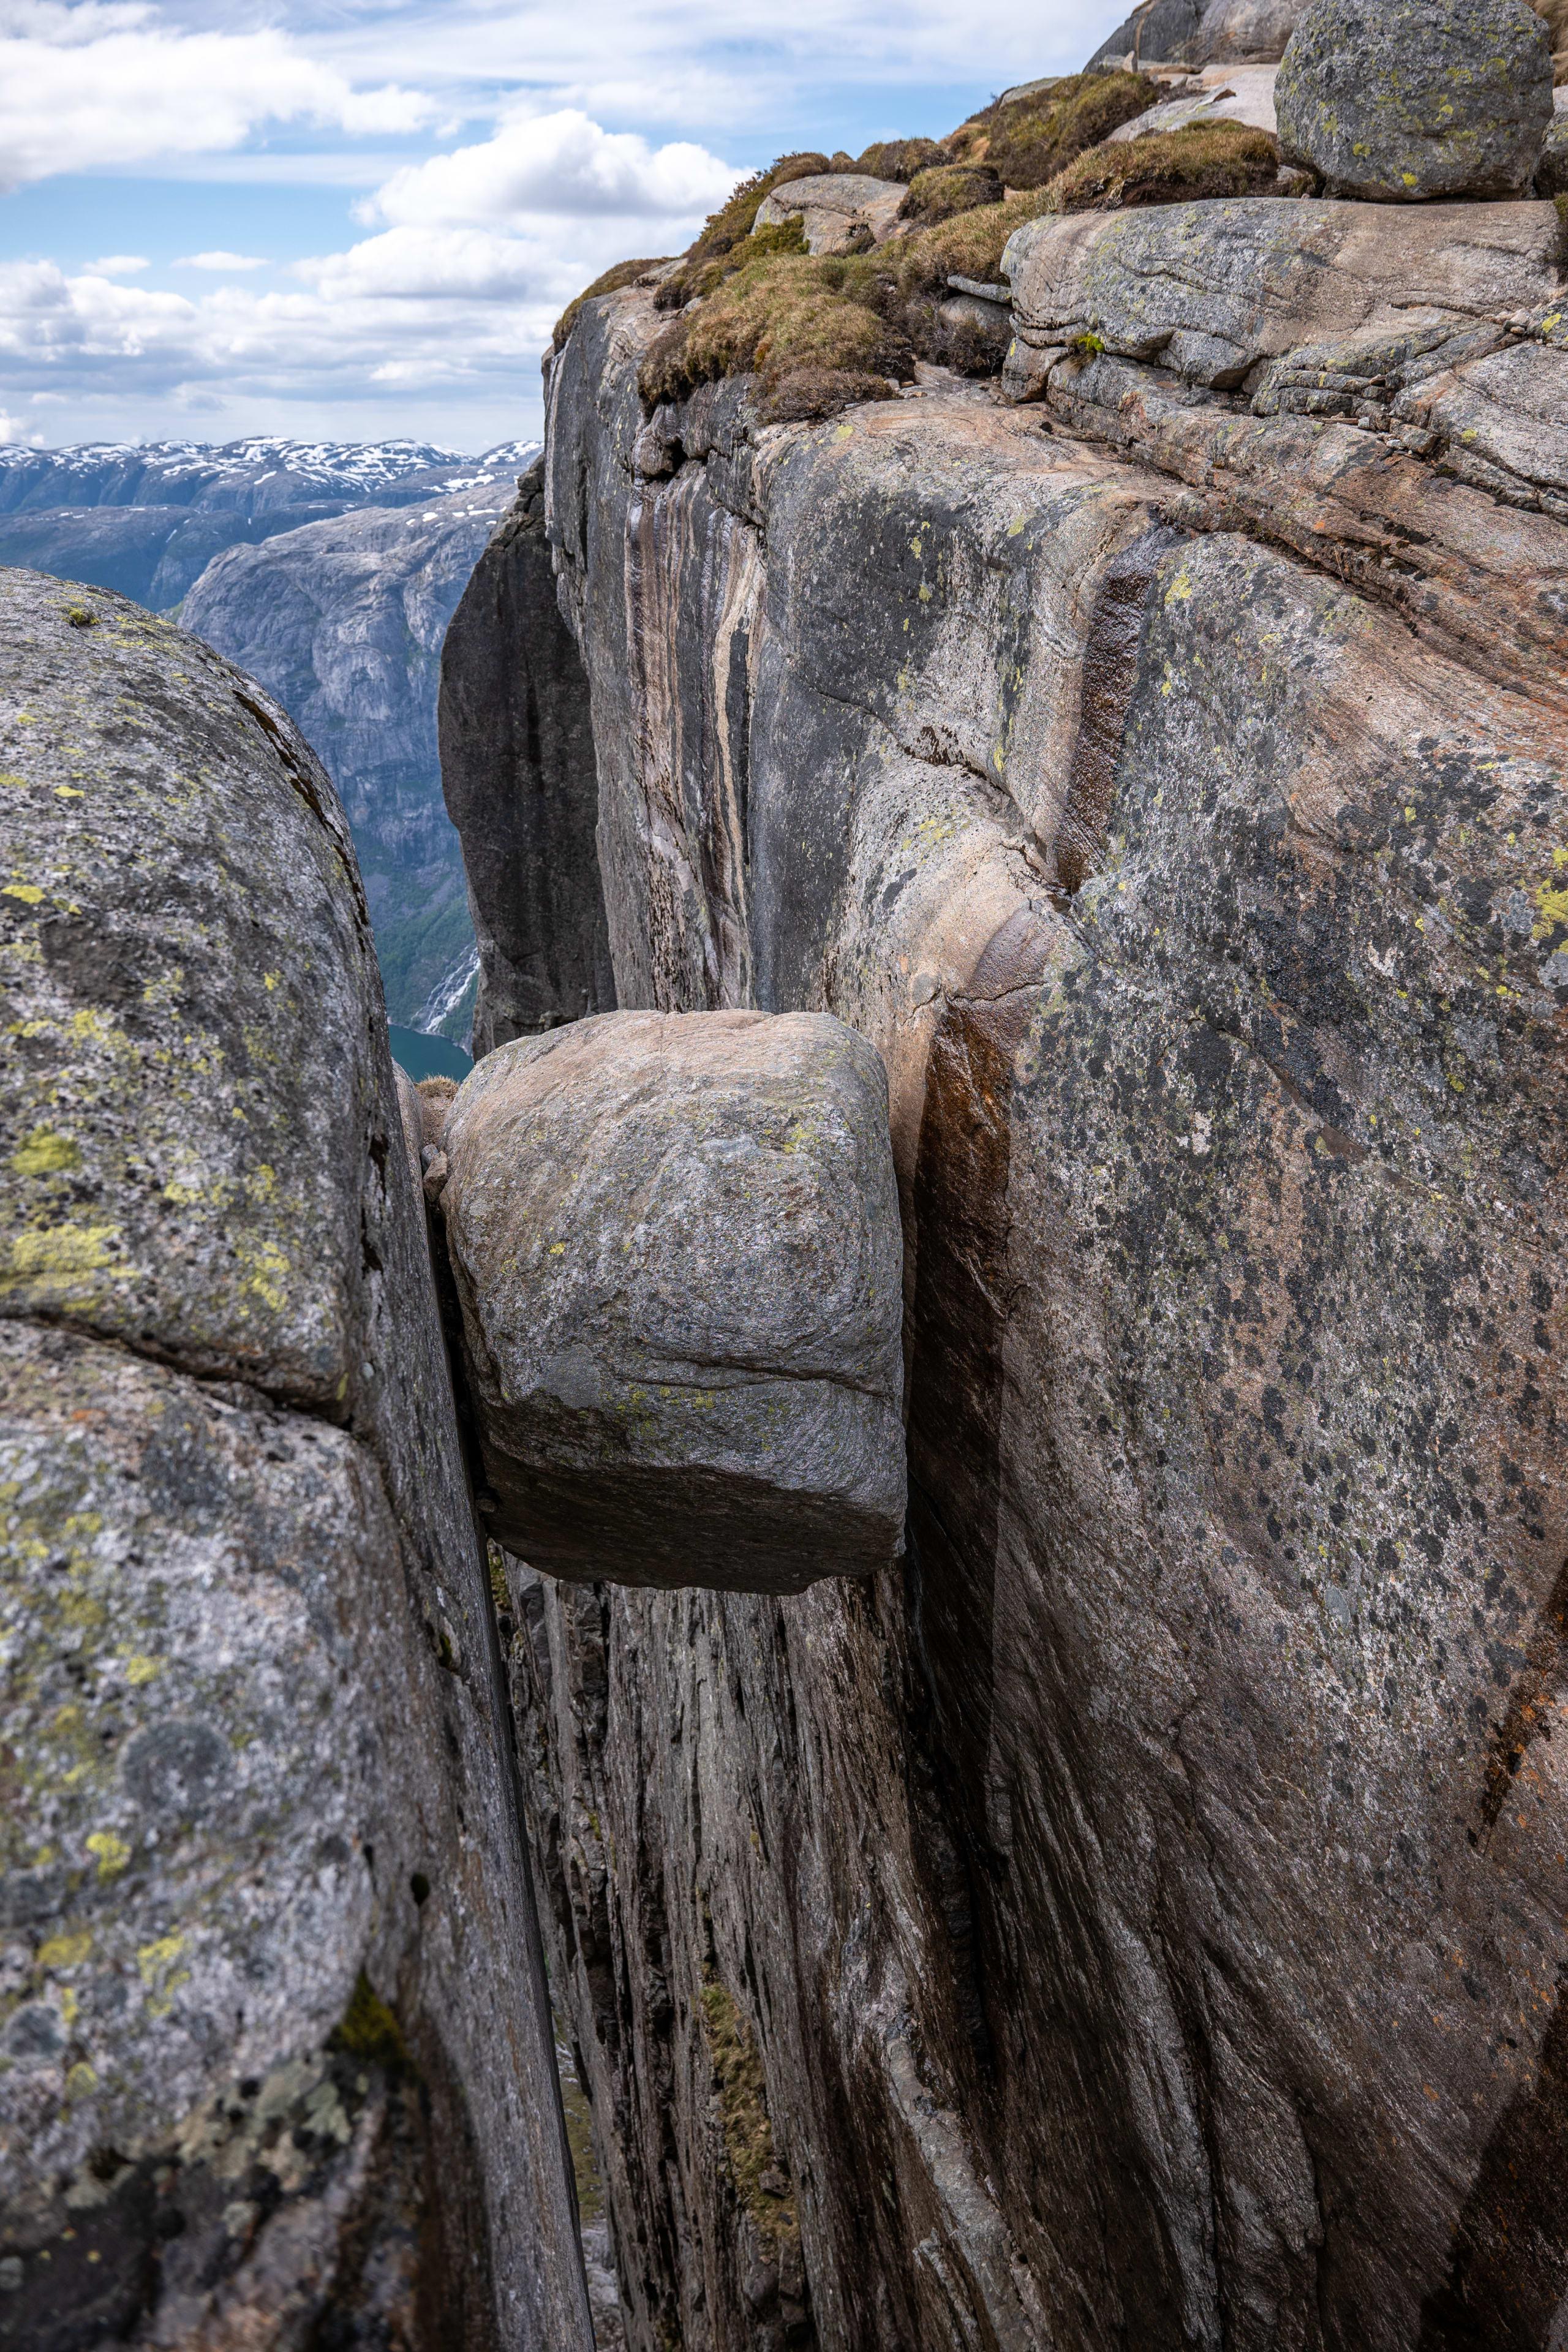 The Kjerag boulder stuck between the 2 rock faces